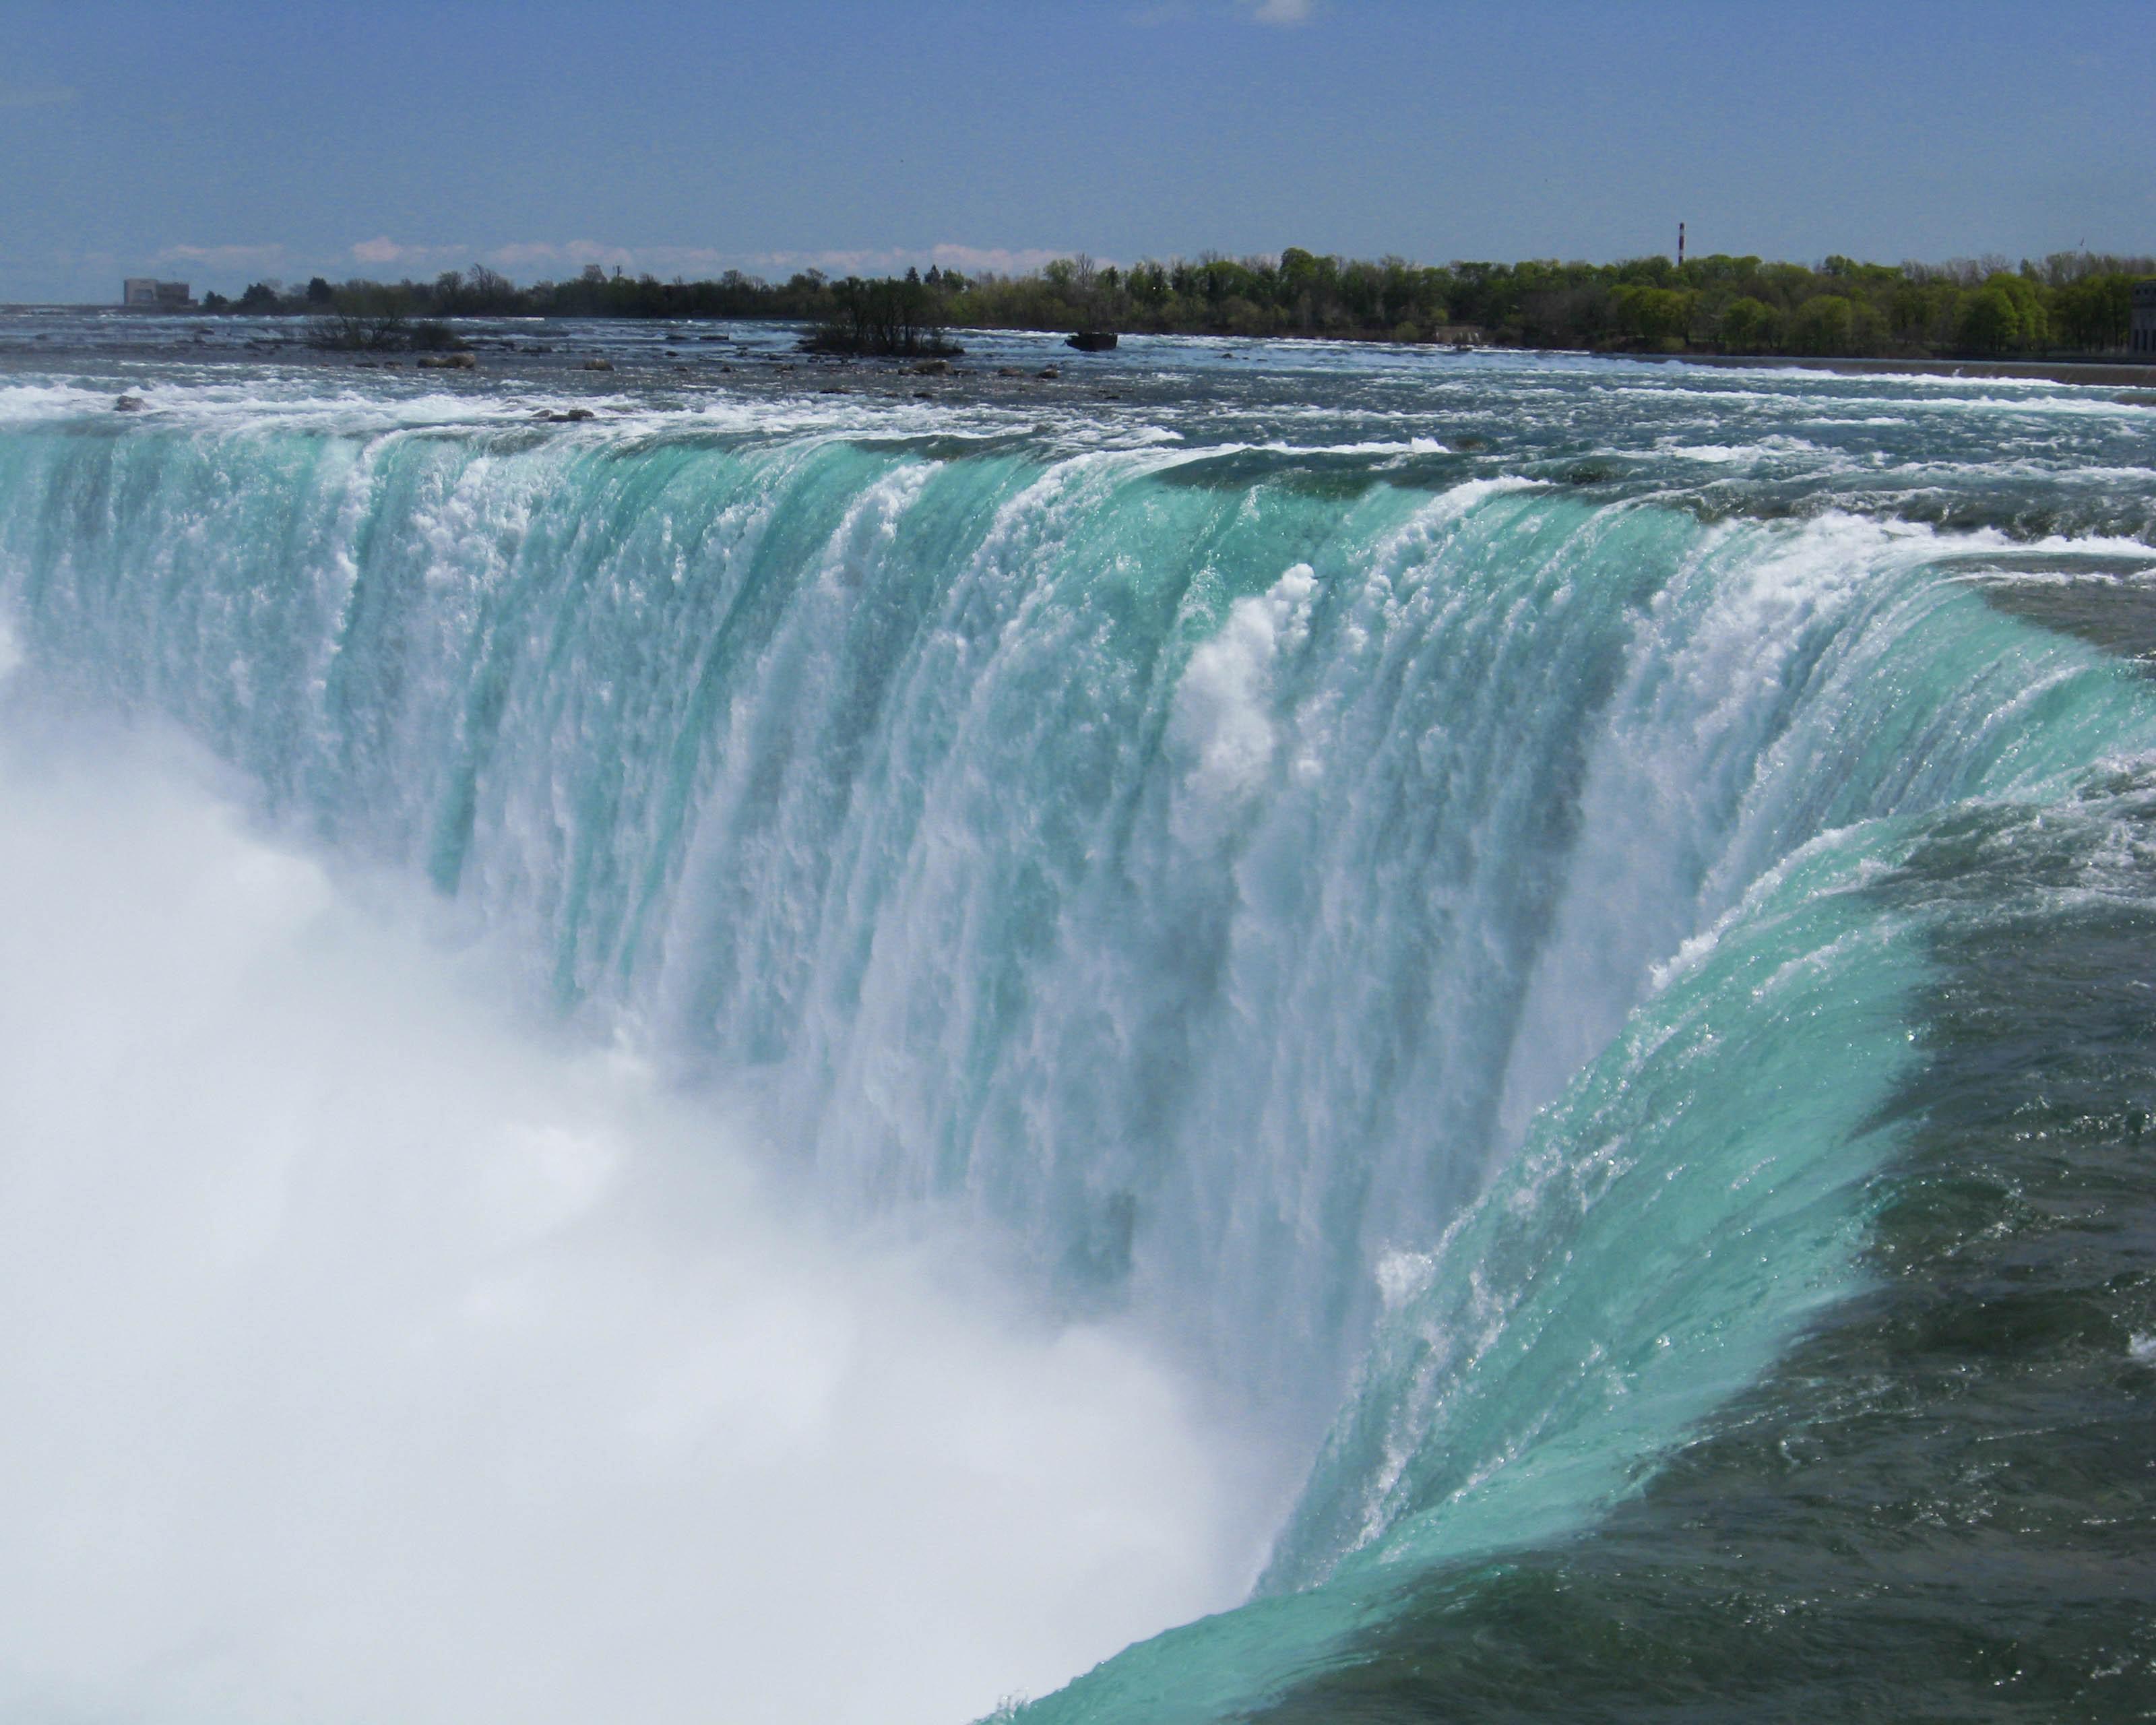 Numa Falls Wallpaper Hd Amazing Landscape View Of Niagara Falls In Ny United